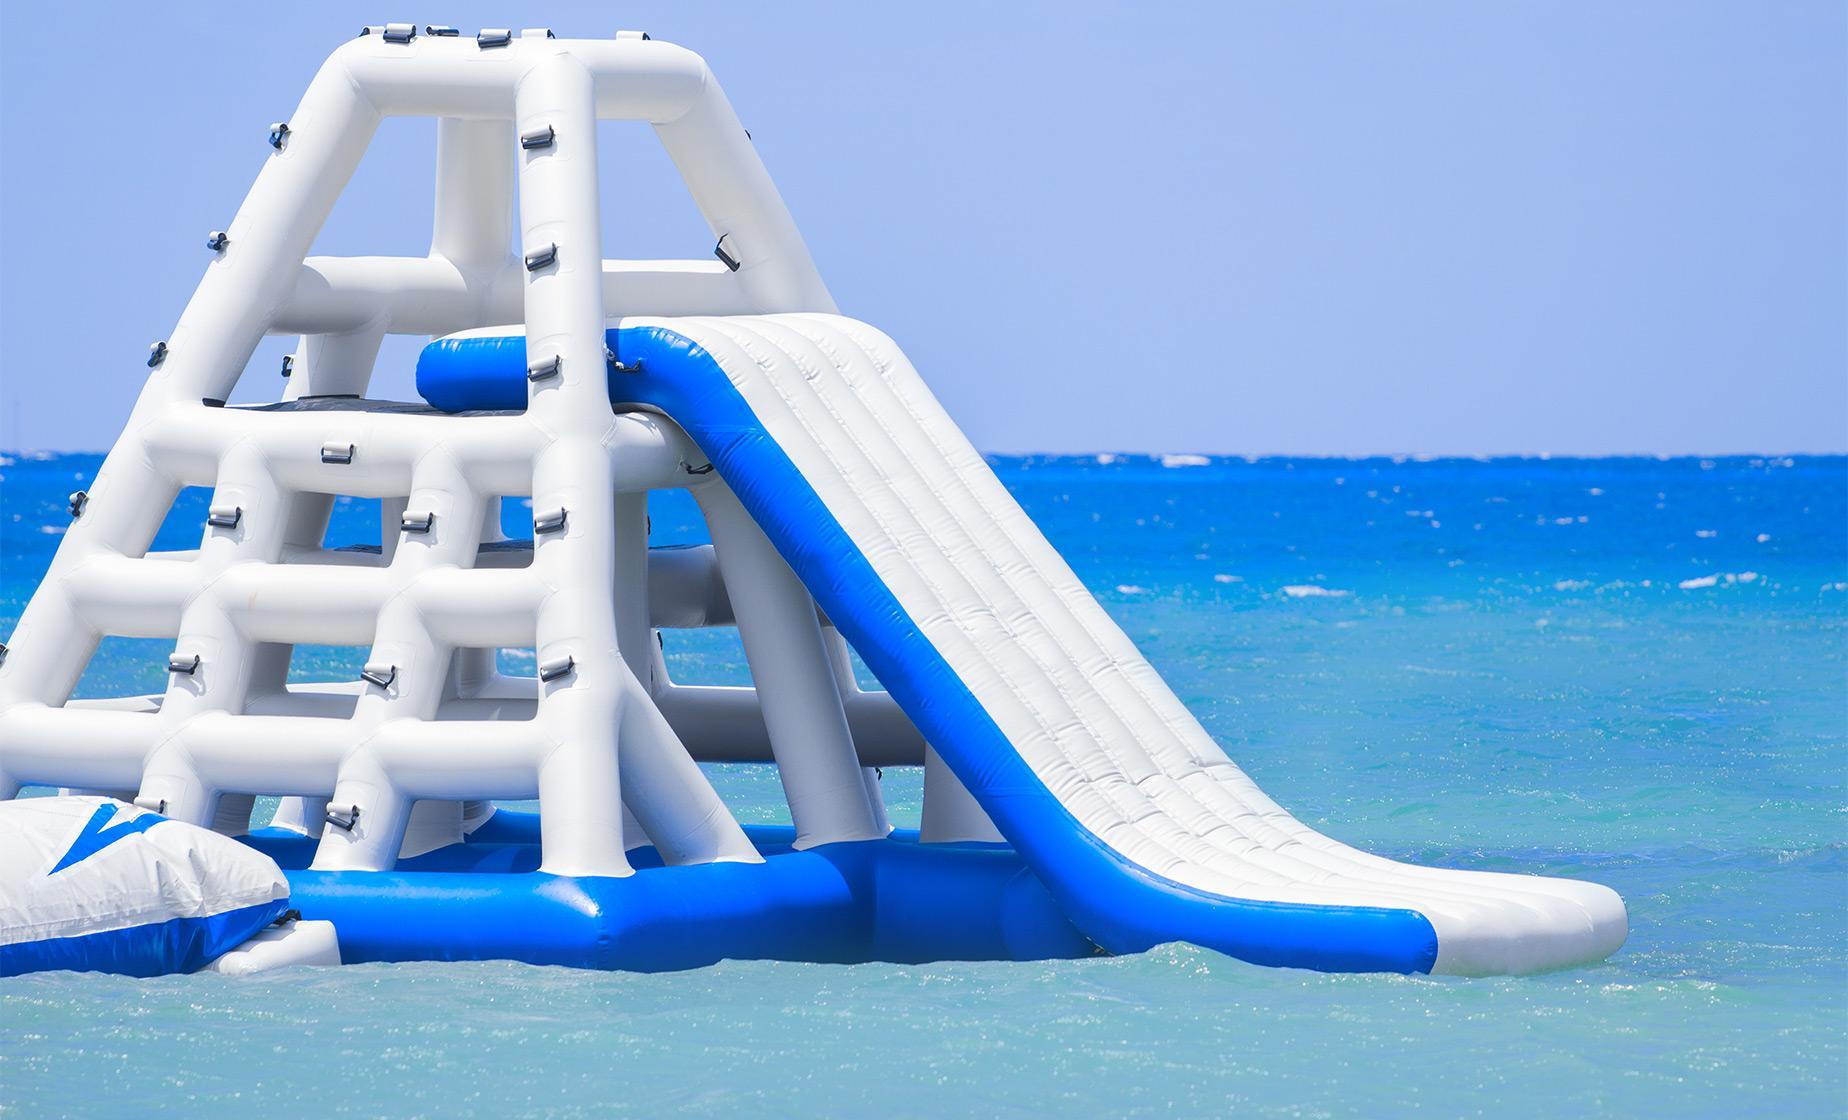 Cozumel Playa Mia Beach Buffet S Excursions Port Tours